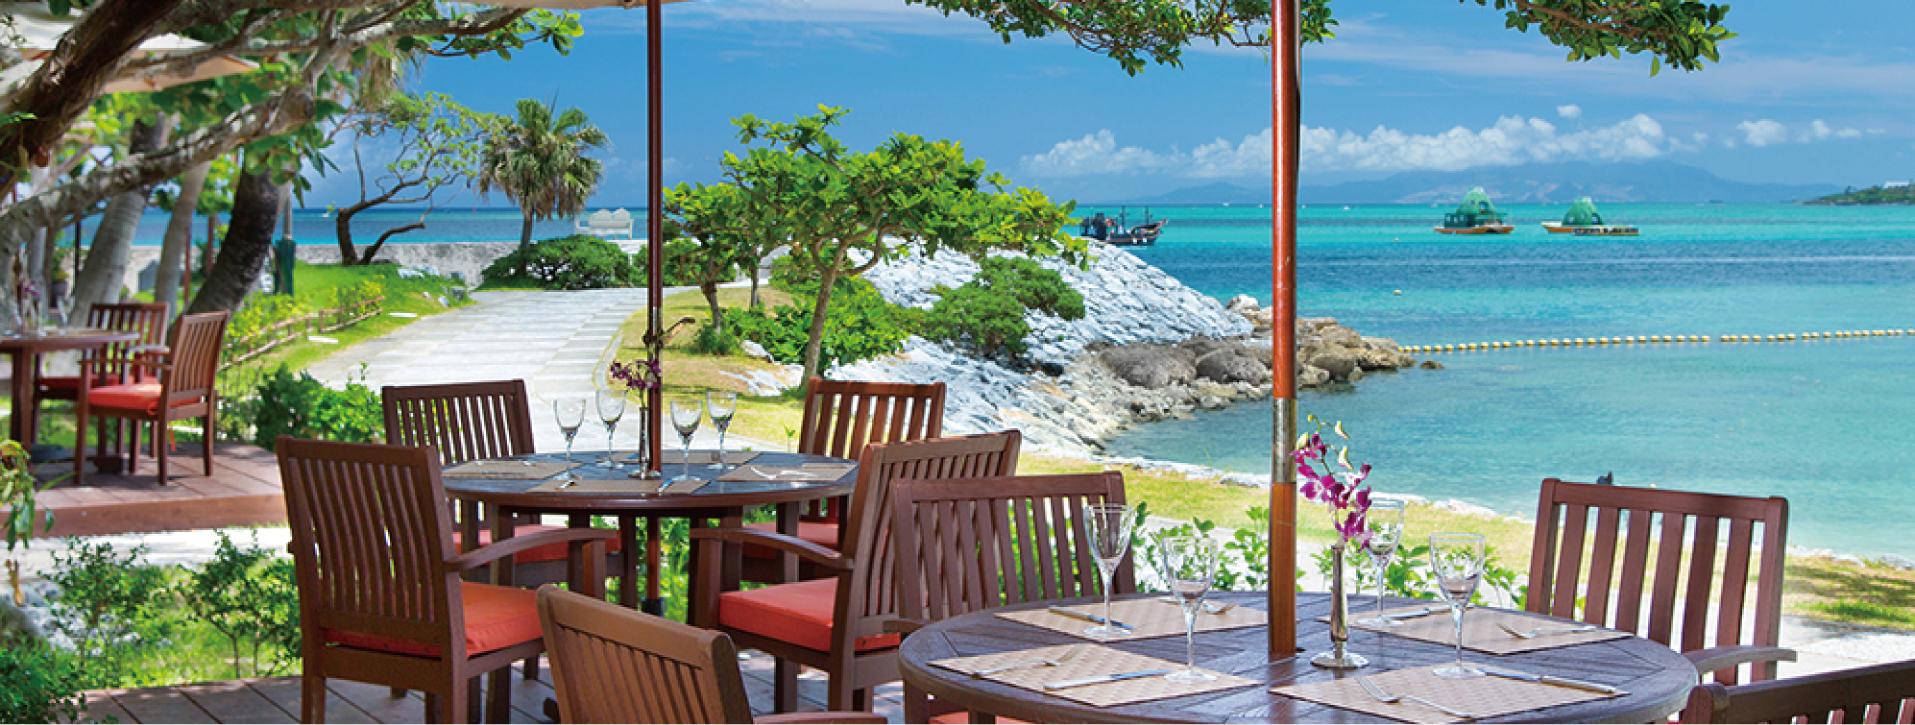 Renaissance okinawa resort for Design hotel okinawa